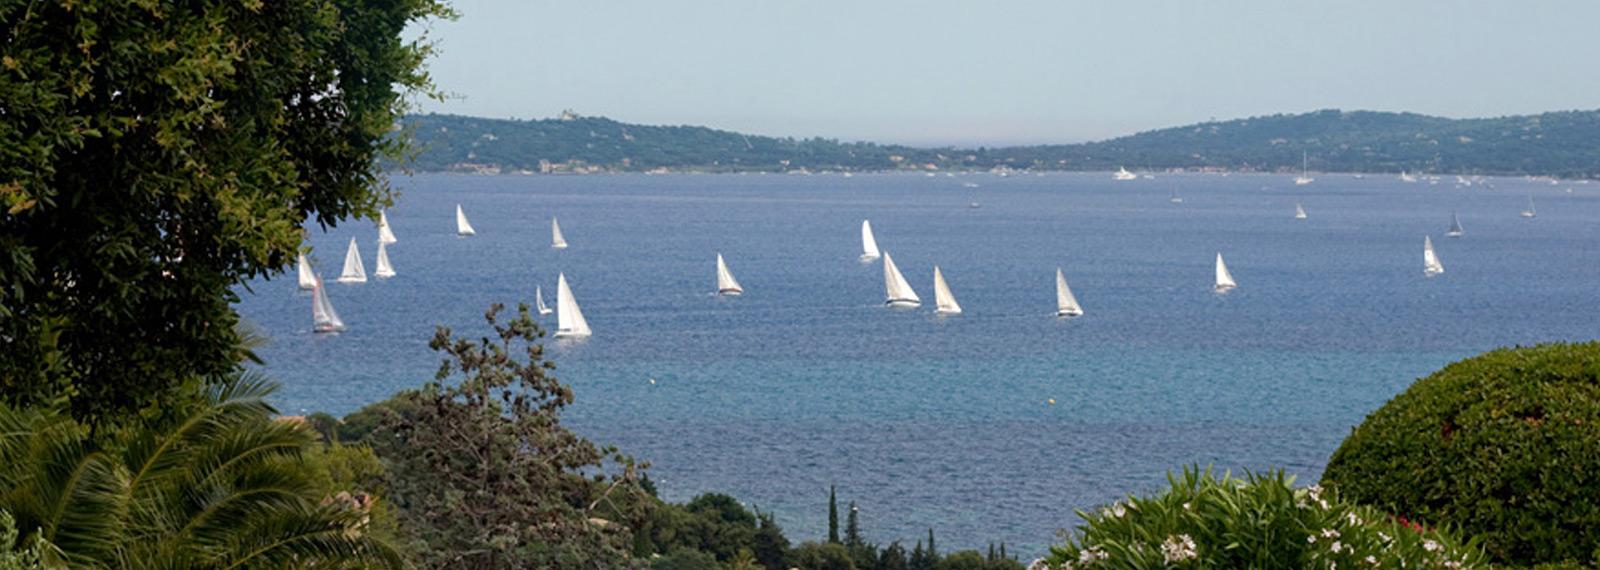 Vue mer Saint Tropez